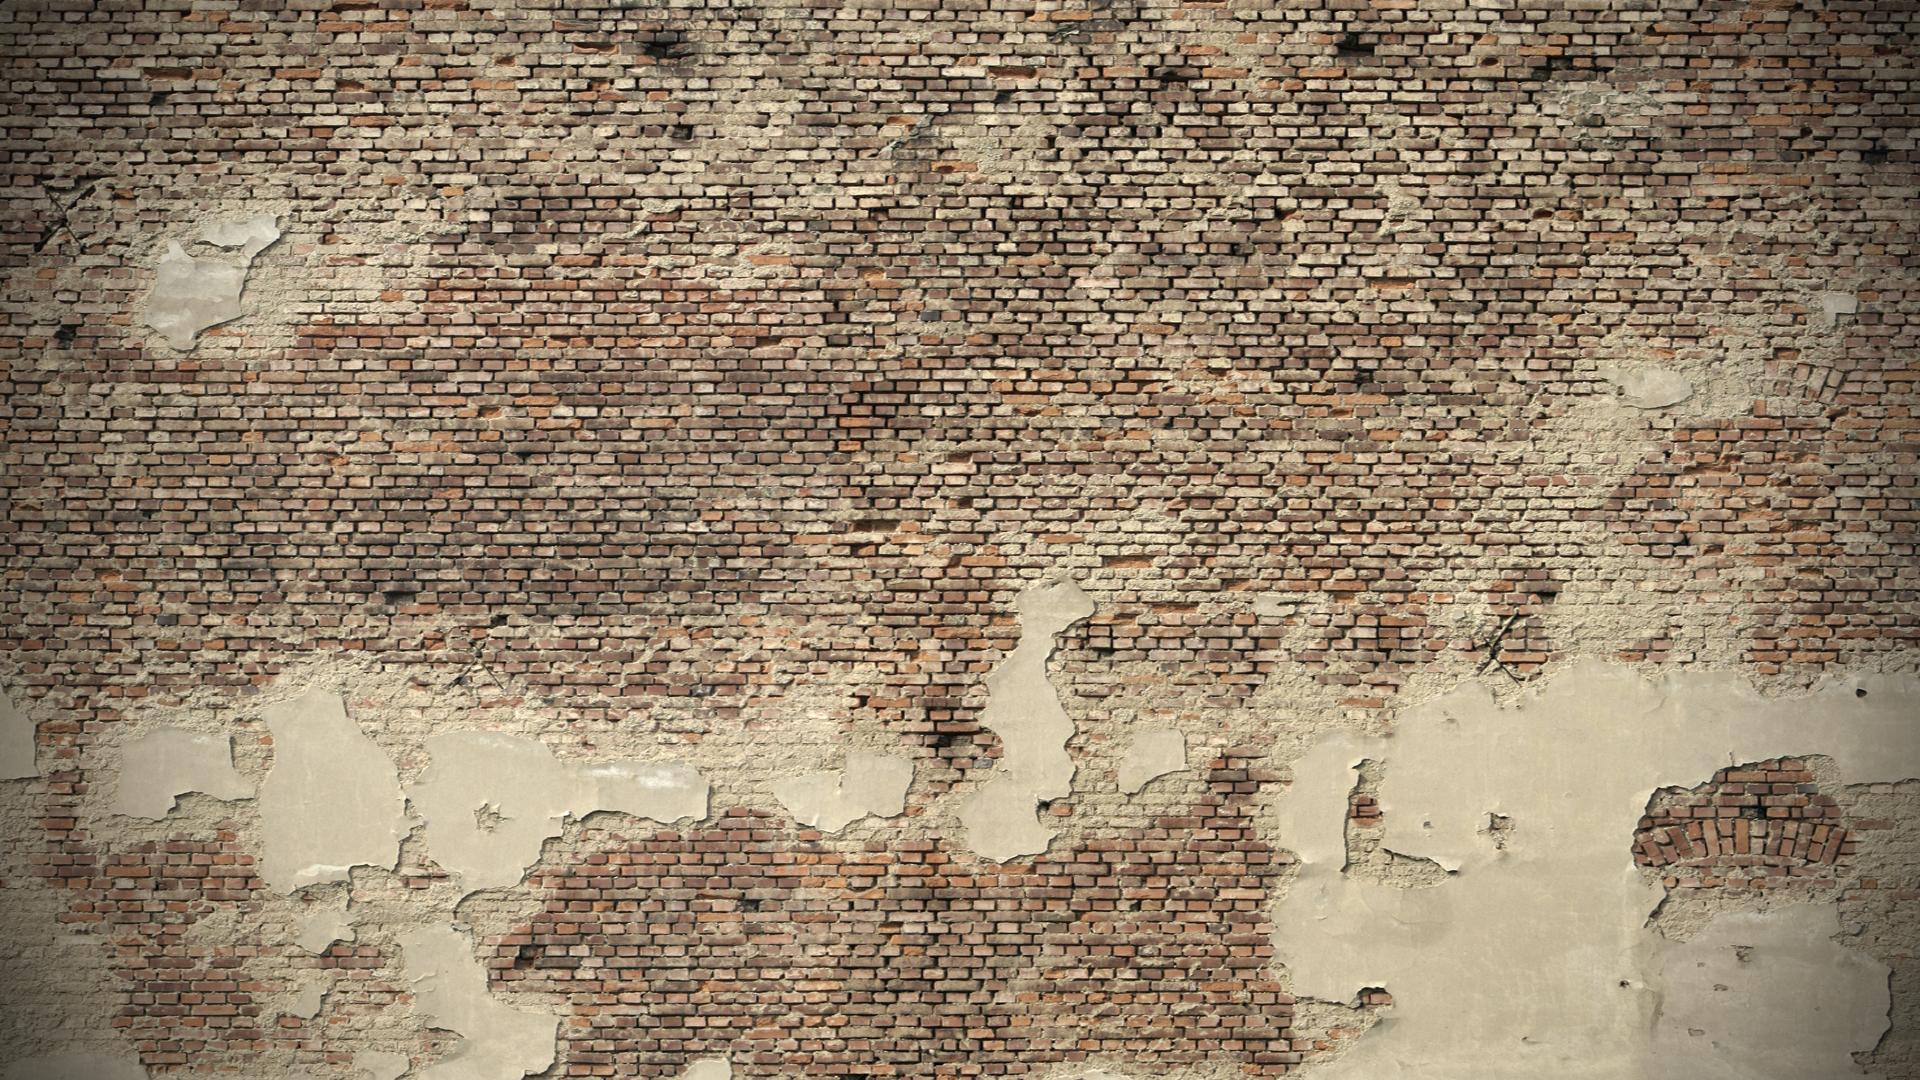 Wall Textures Wallpaper 1920x1080 Wall Textures Bricks Brick Wall 1920x1080